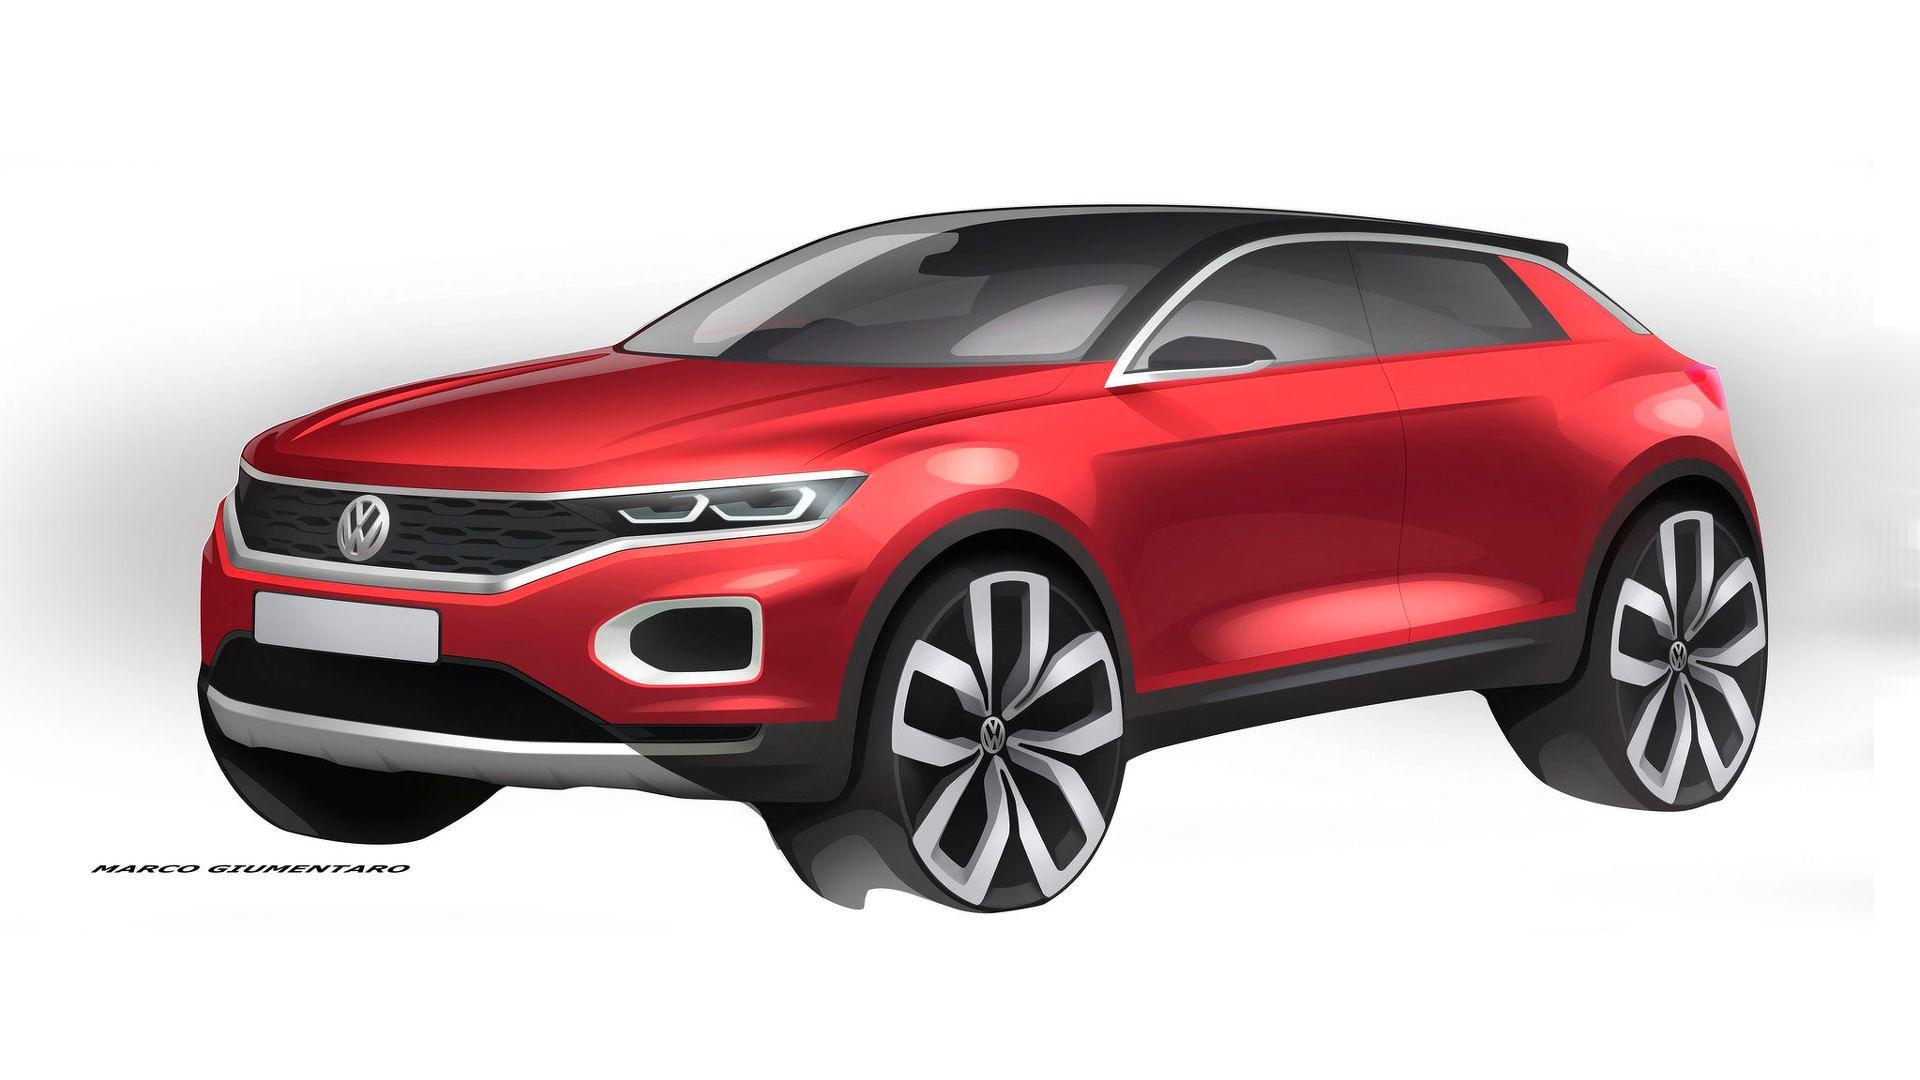 volkswagen-sap-trinh-lang-mau-crossover-dau-tien-canh-tranh-voi-ford-ecosport